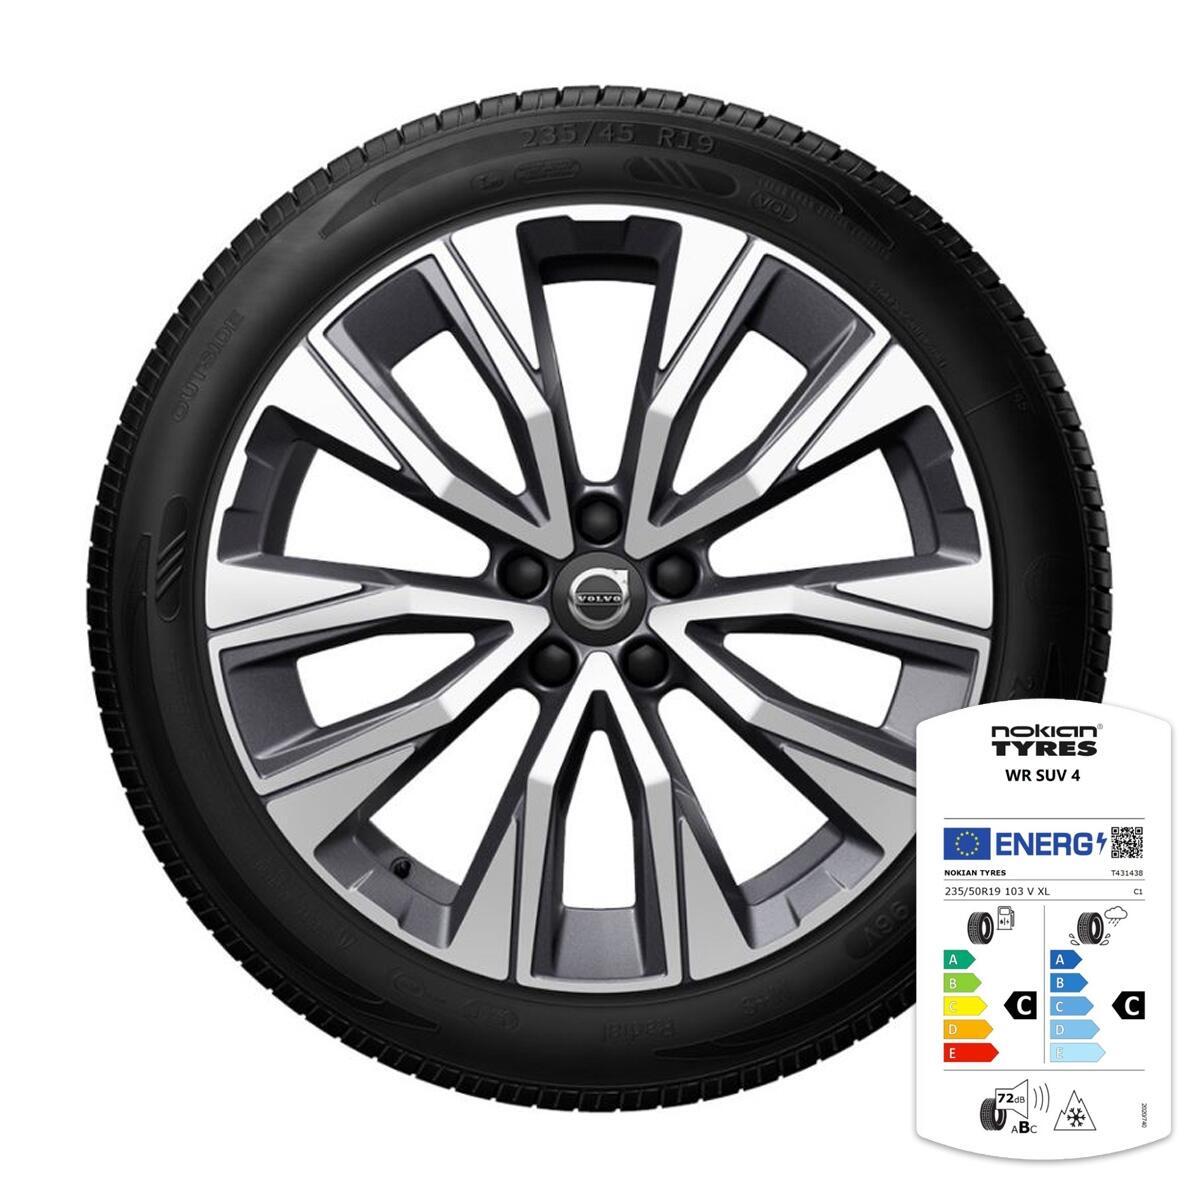 Komplet zimskih koles: 48,26 cm (19''), pnevmatike Nokian